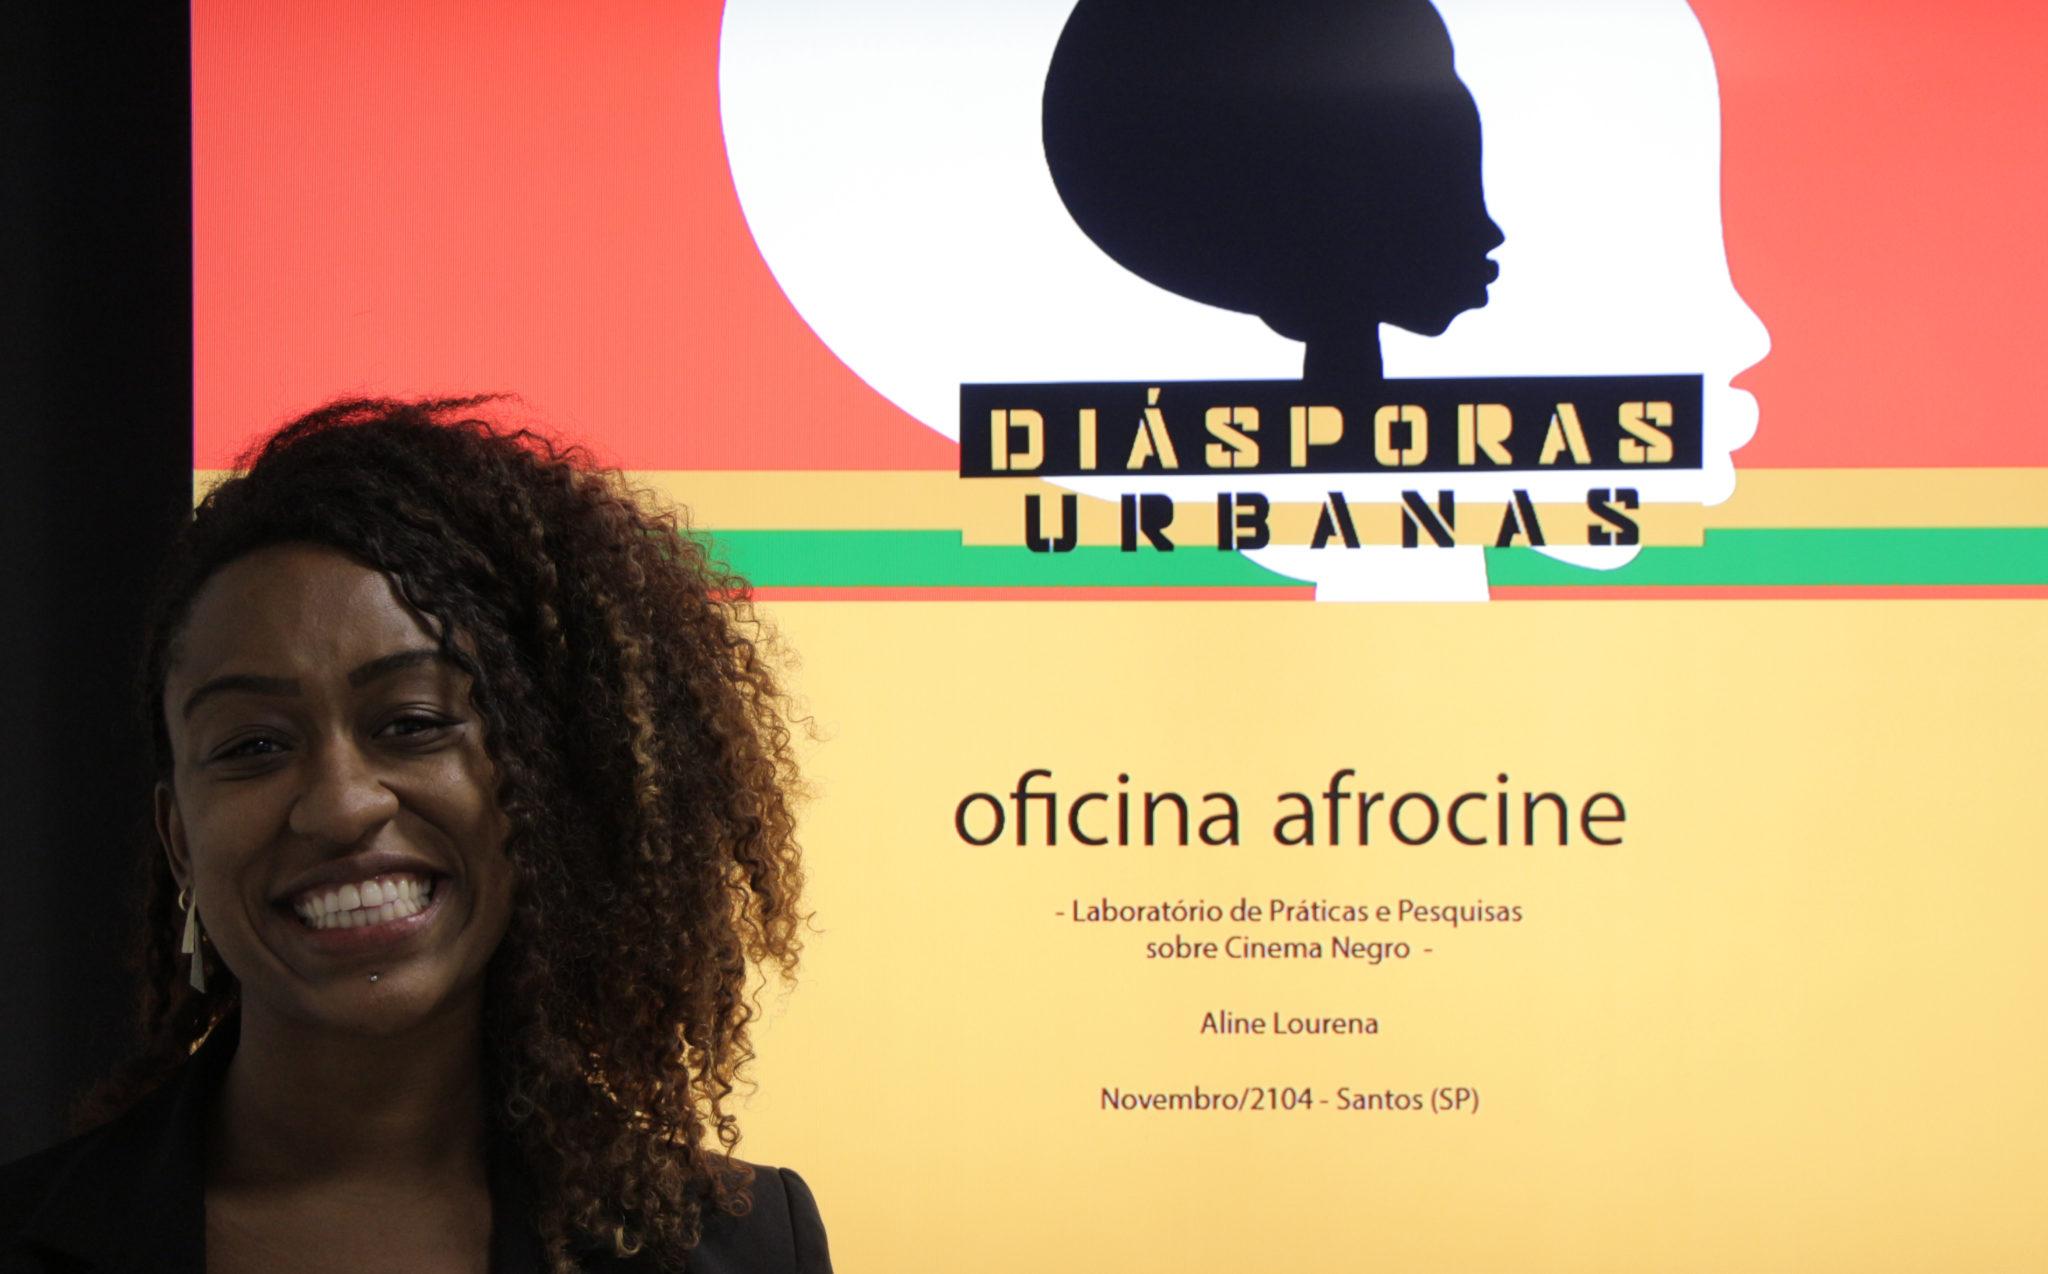 Aline Lourena Oficina Afrocine